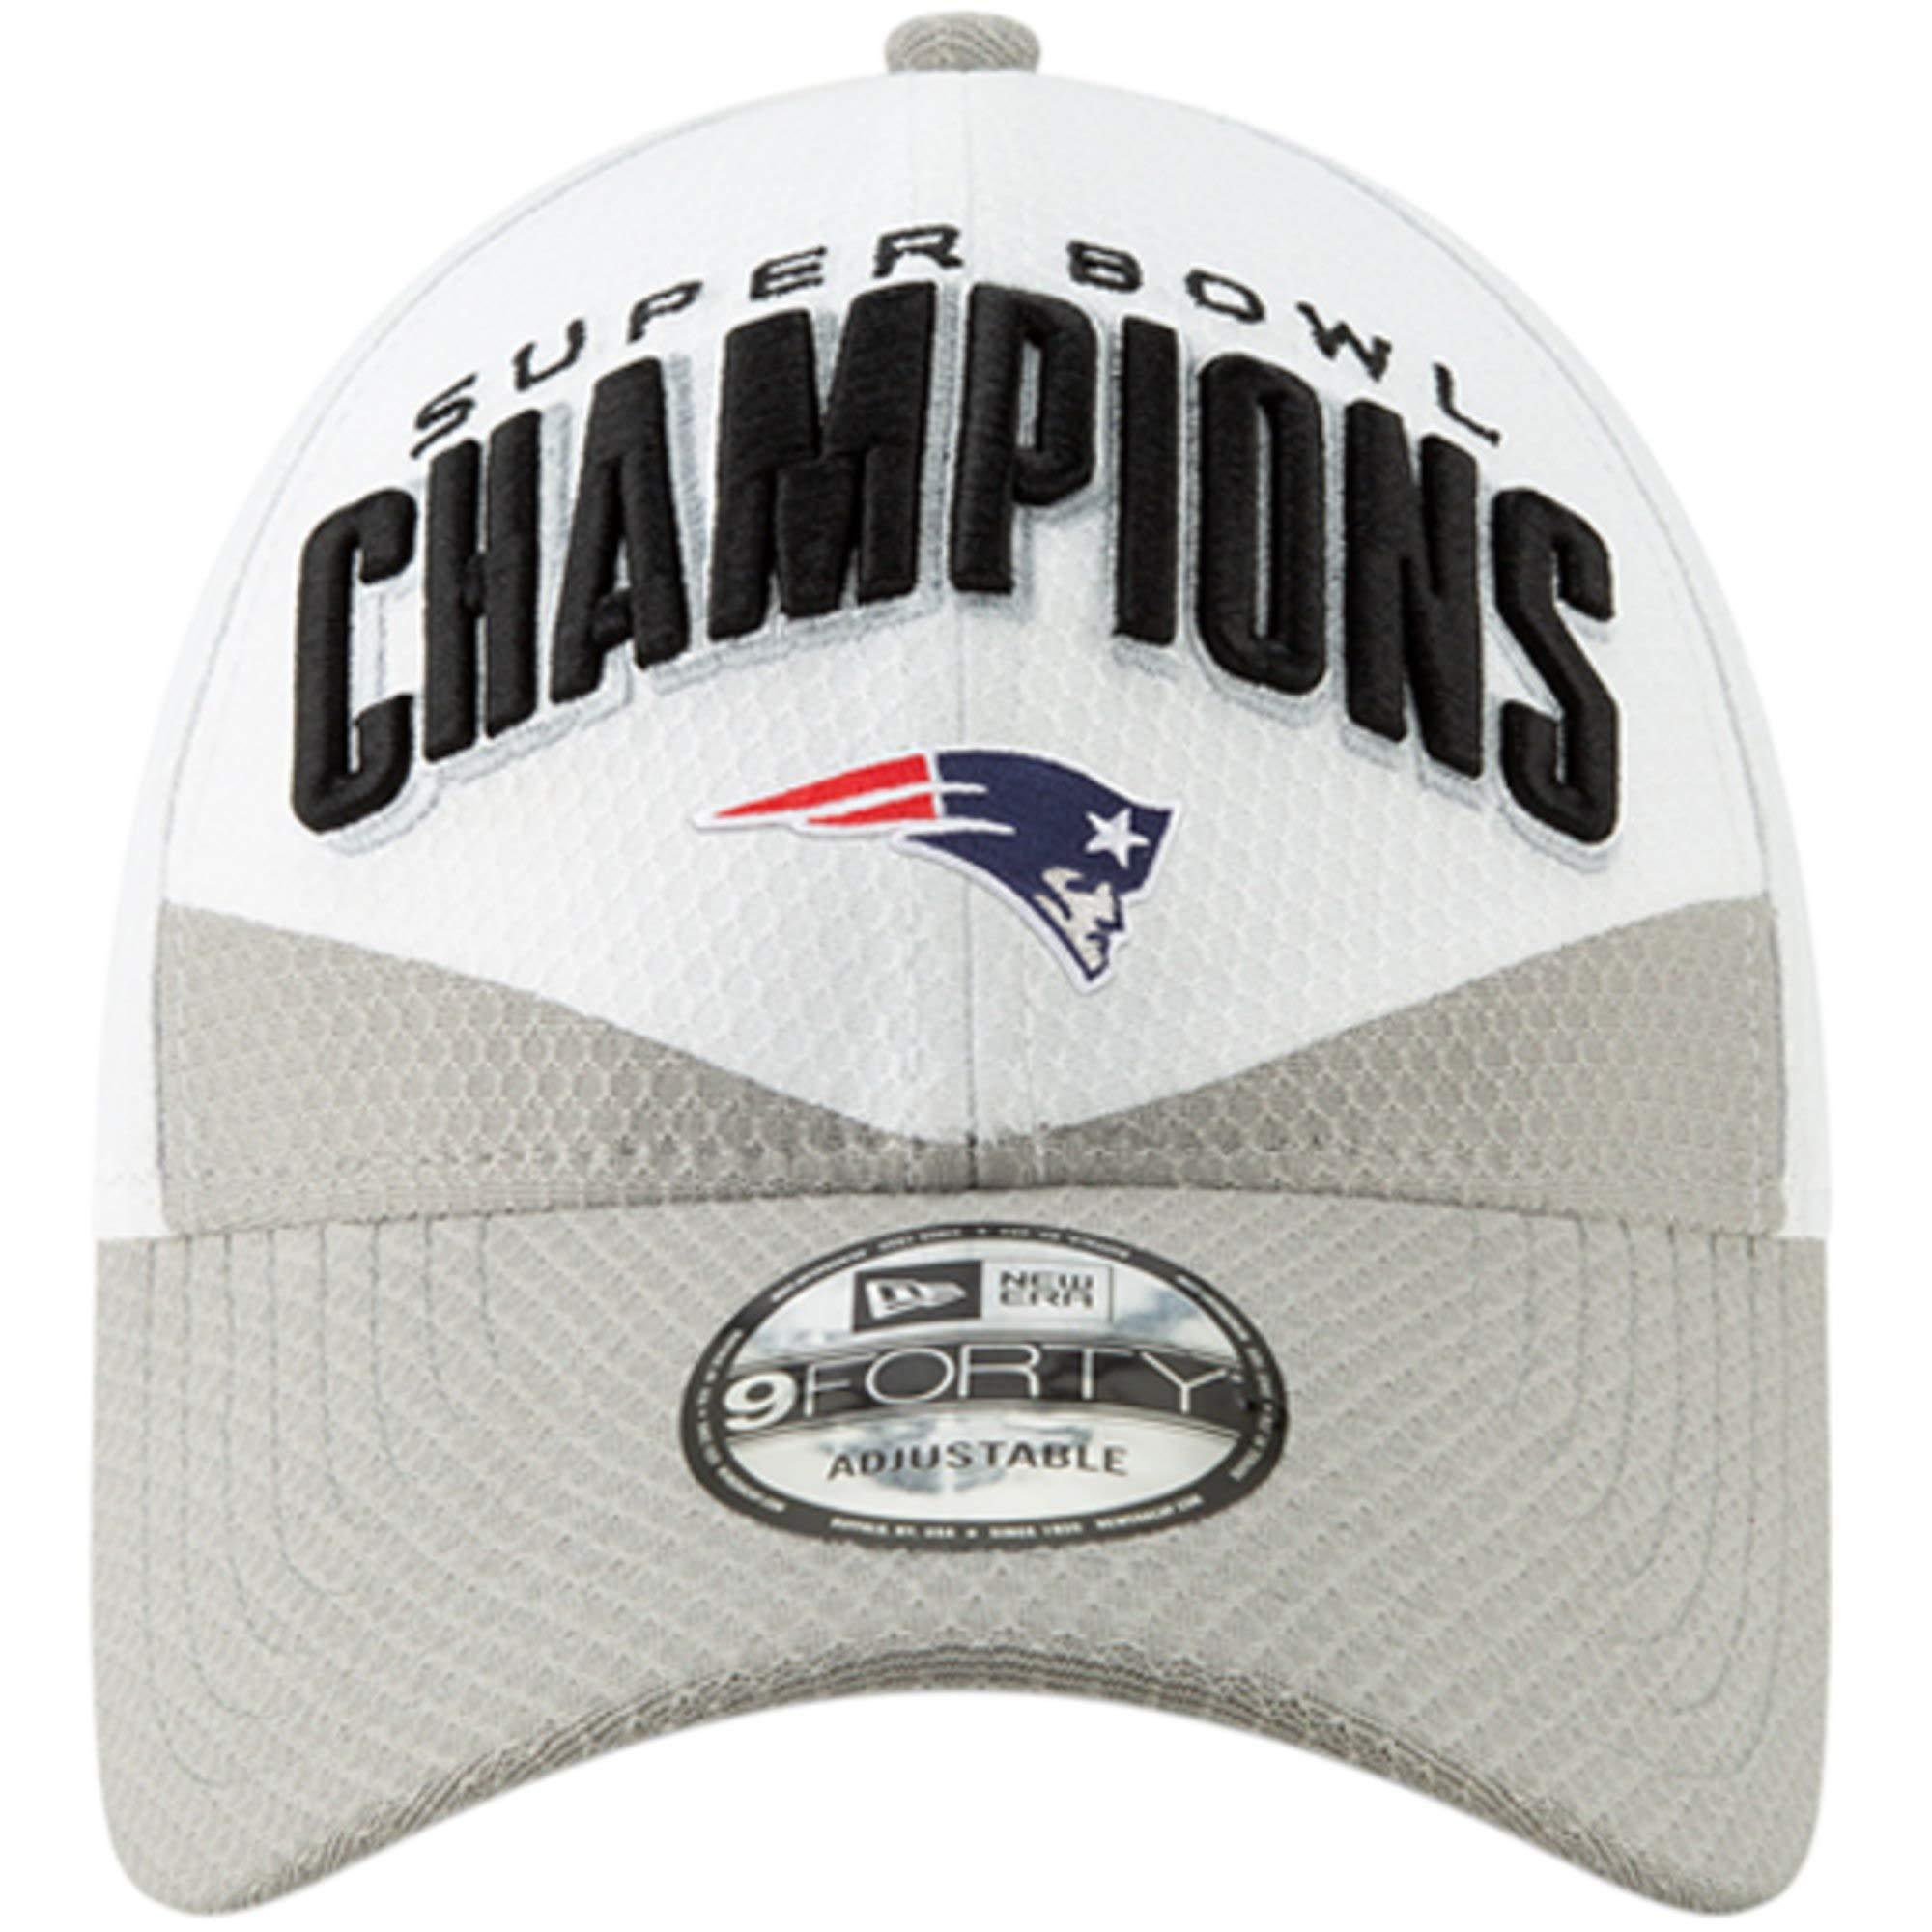 887f62f144589d New Era New England Patriots White/Gray Super Bowl LIII Champions Trophy  Collection Locker Room